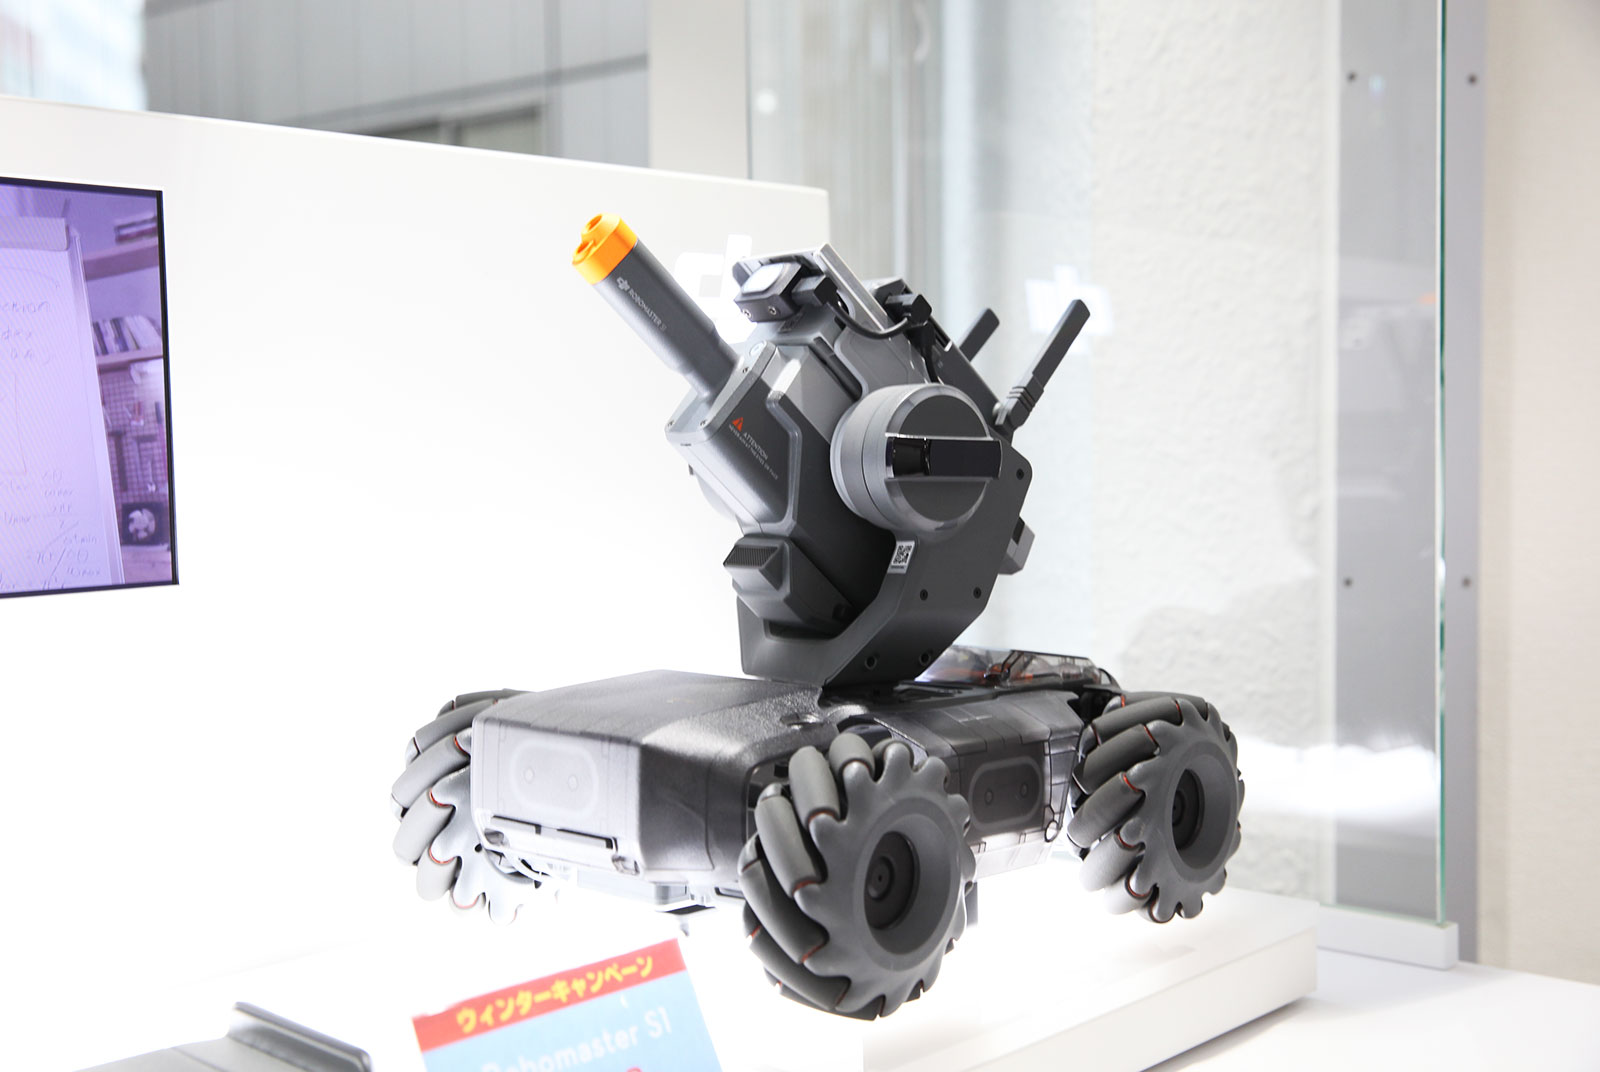 「ROBOMASTER S1」